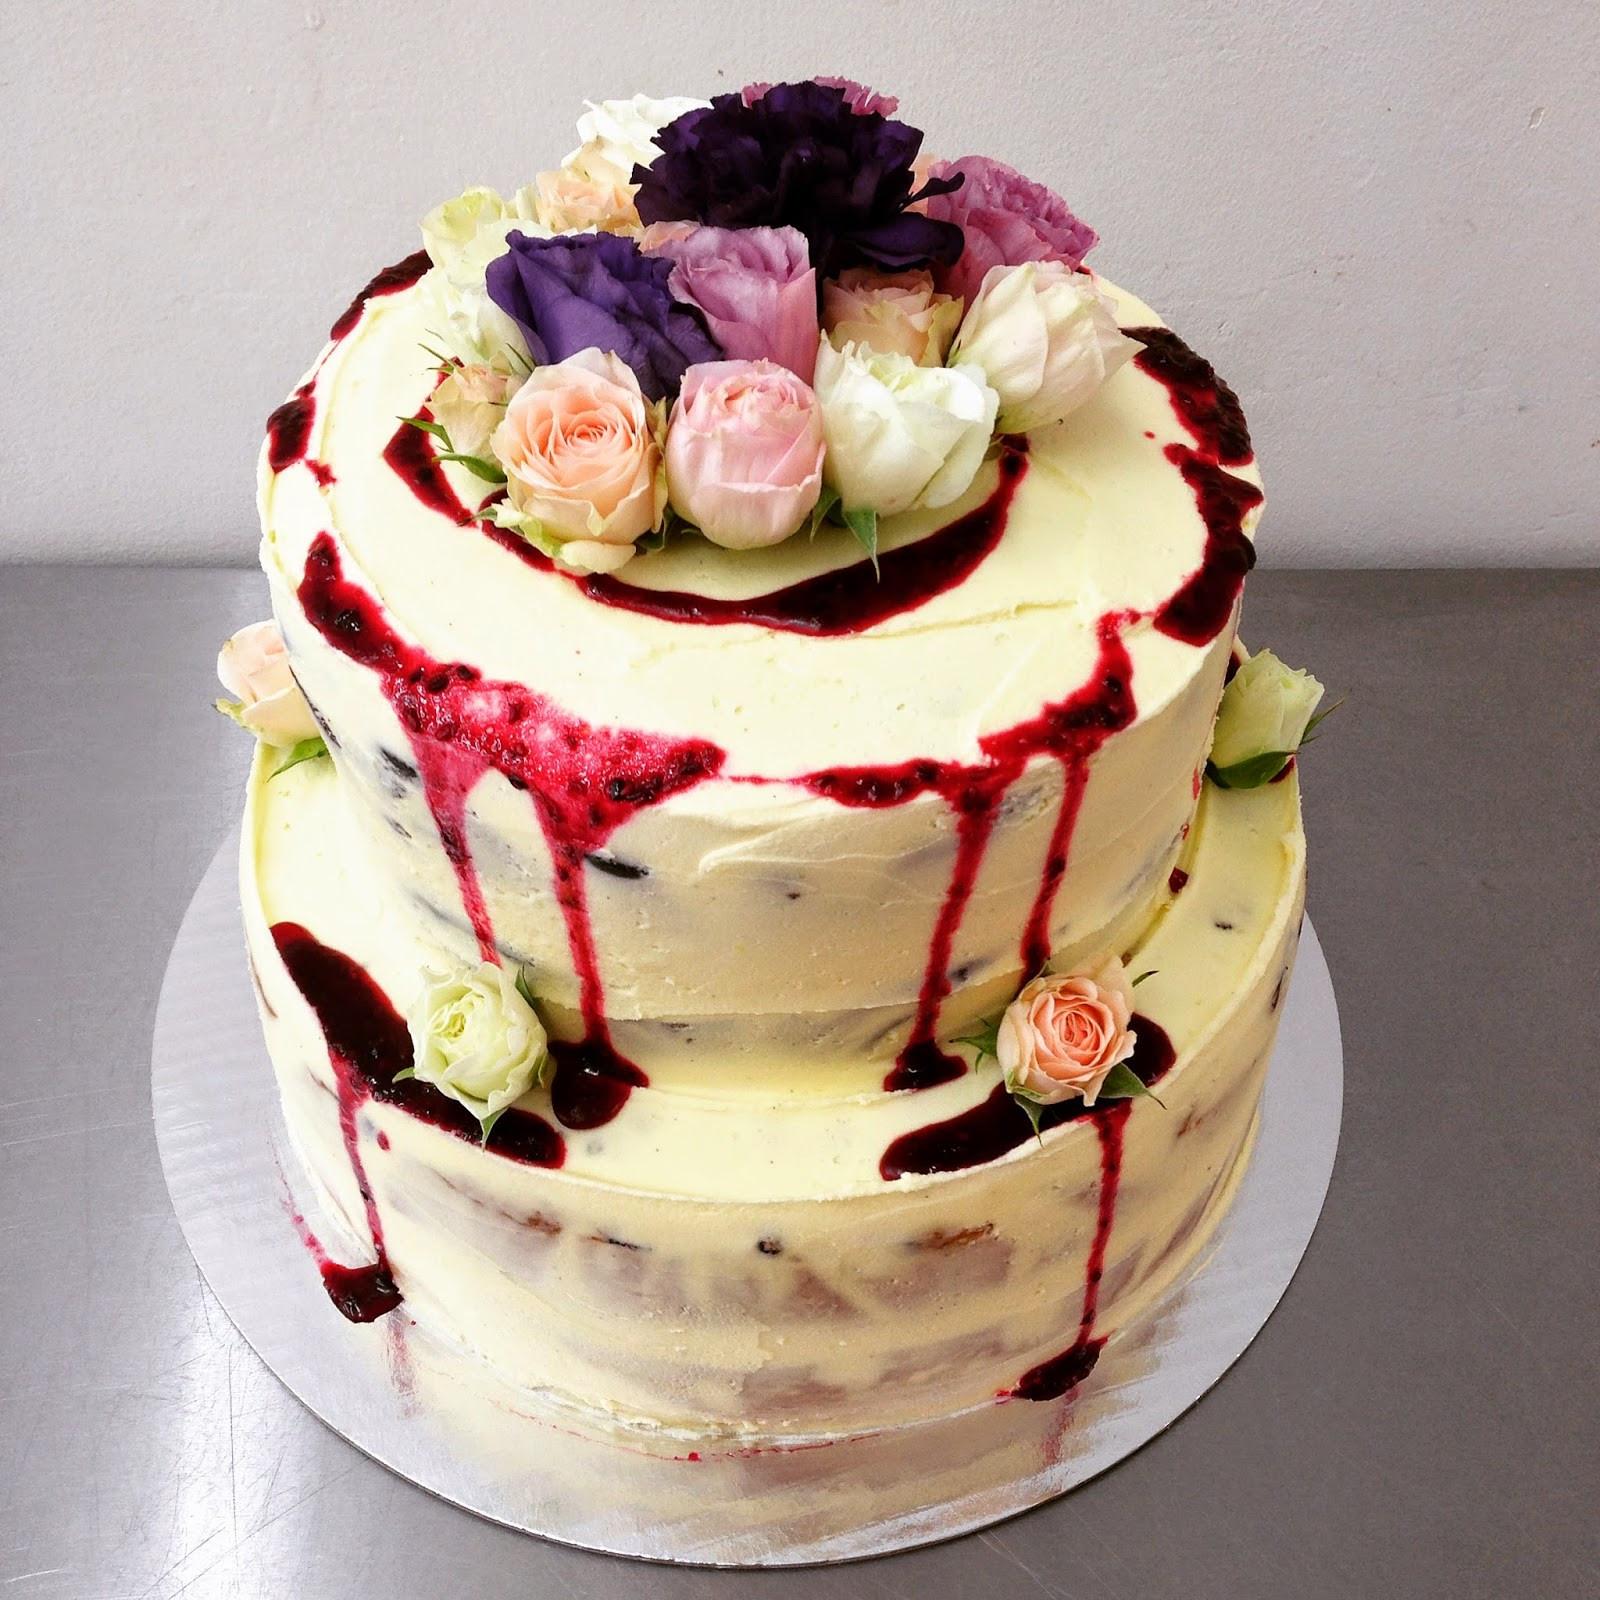 Vegan Wedding Cake Recipe  Vegan Wedding Cake Recipe